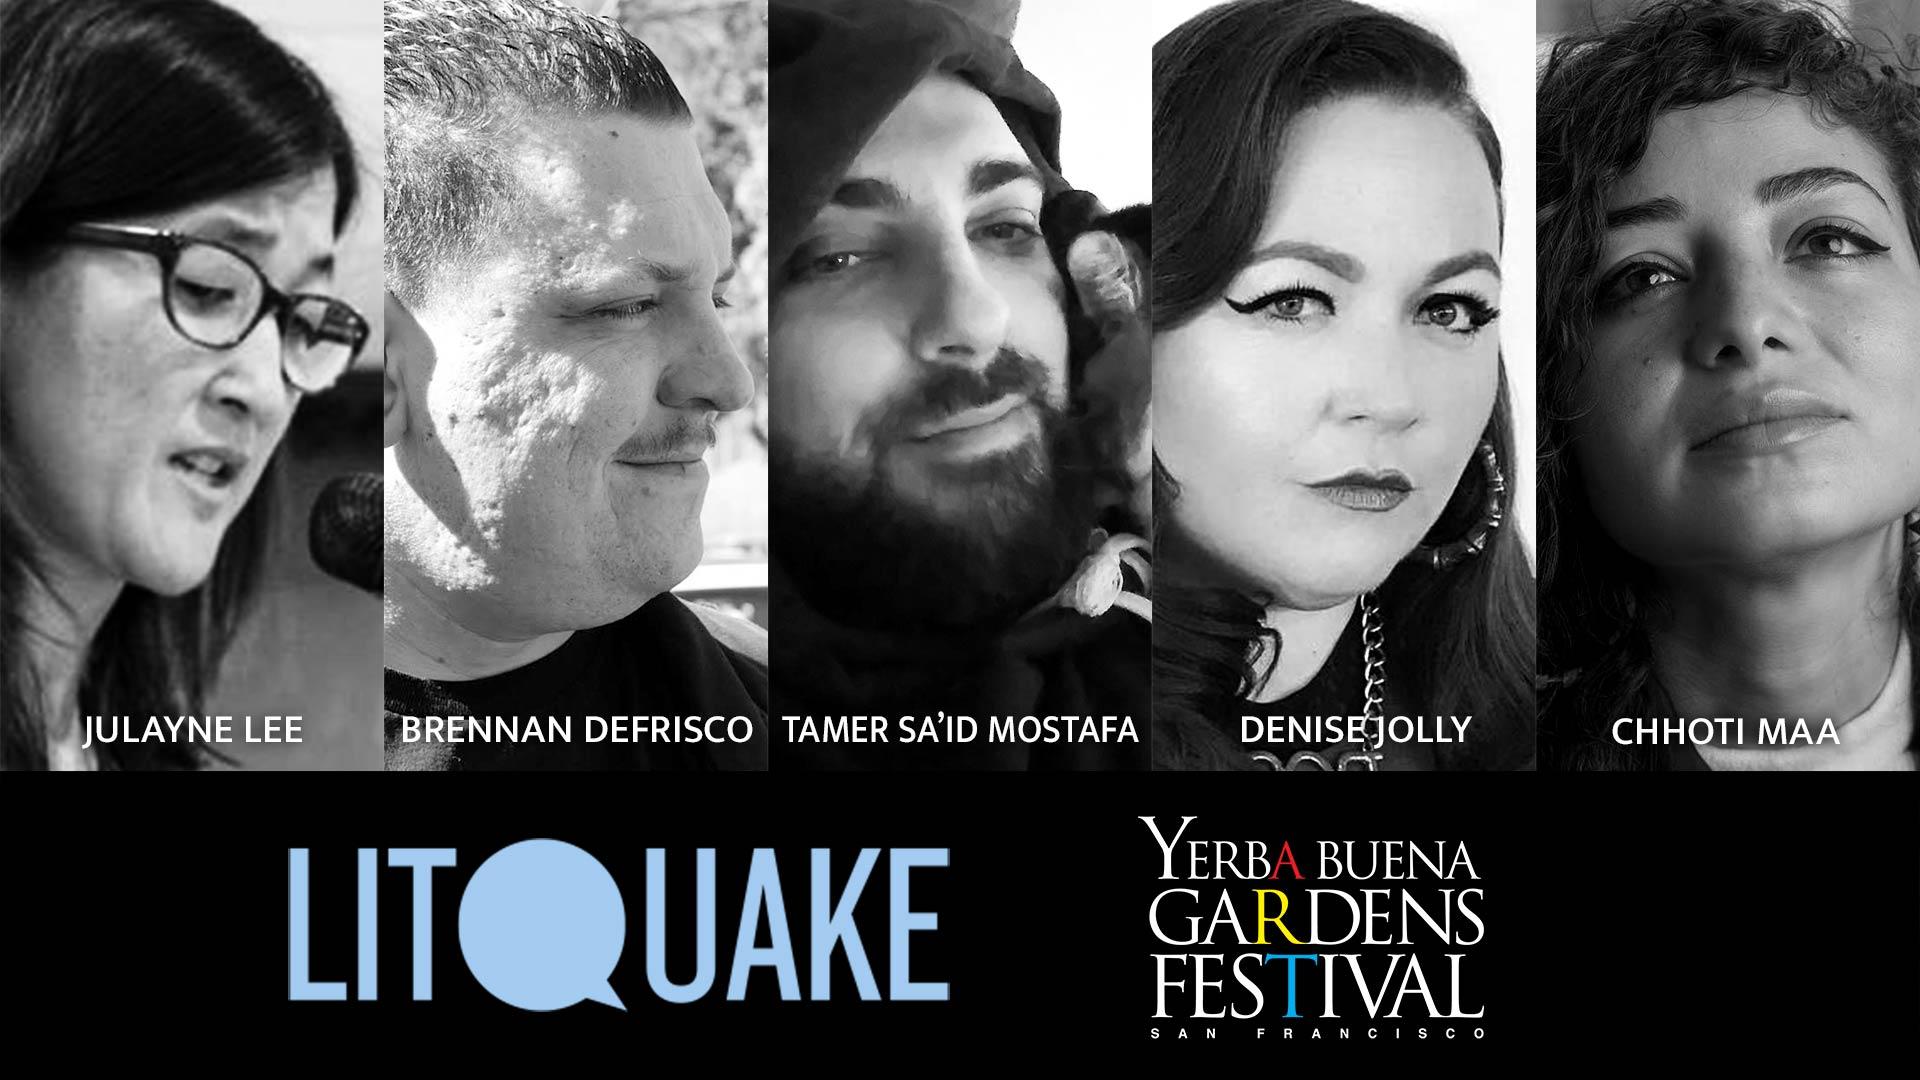 Photos of poets Julayne Lee, Brennan DeFrisco, Tamer Sa'id Mostafa, Denise Jolly, and musical guest Chhoti Maa